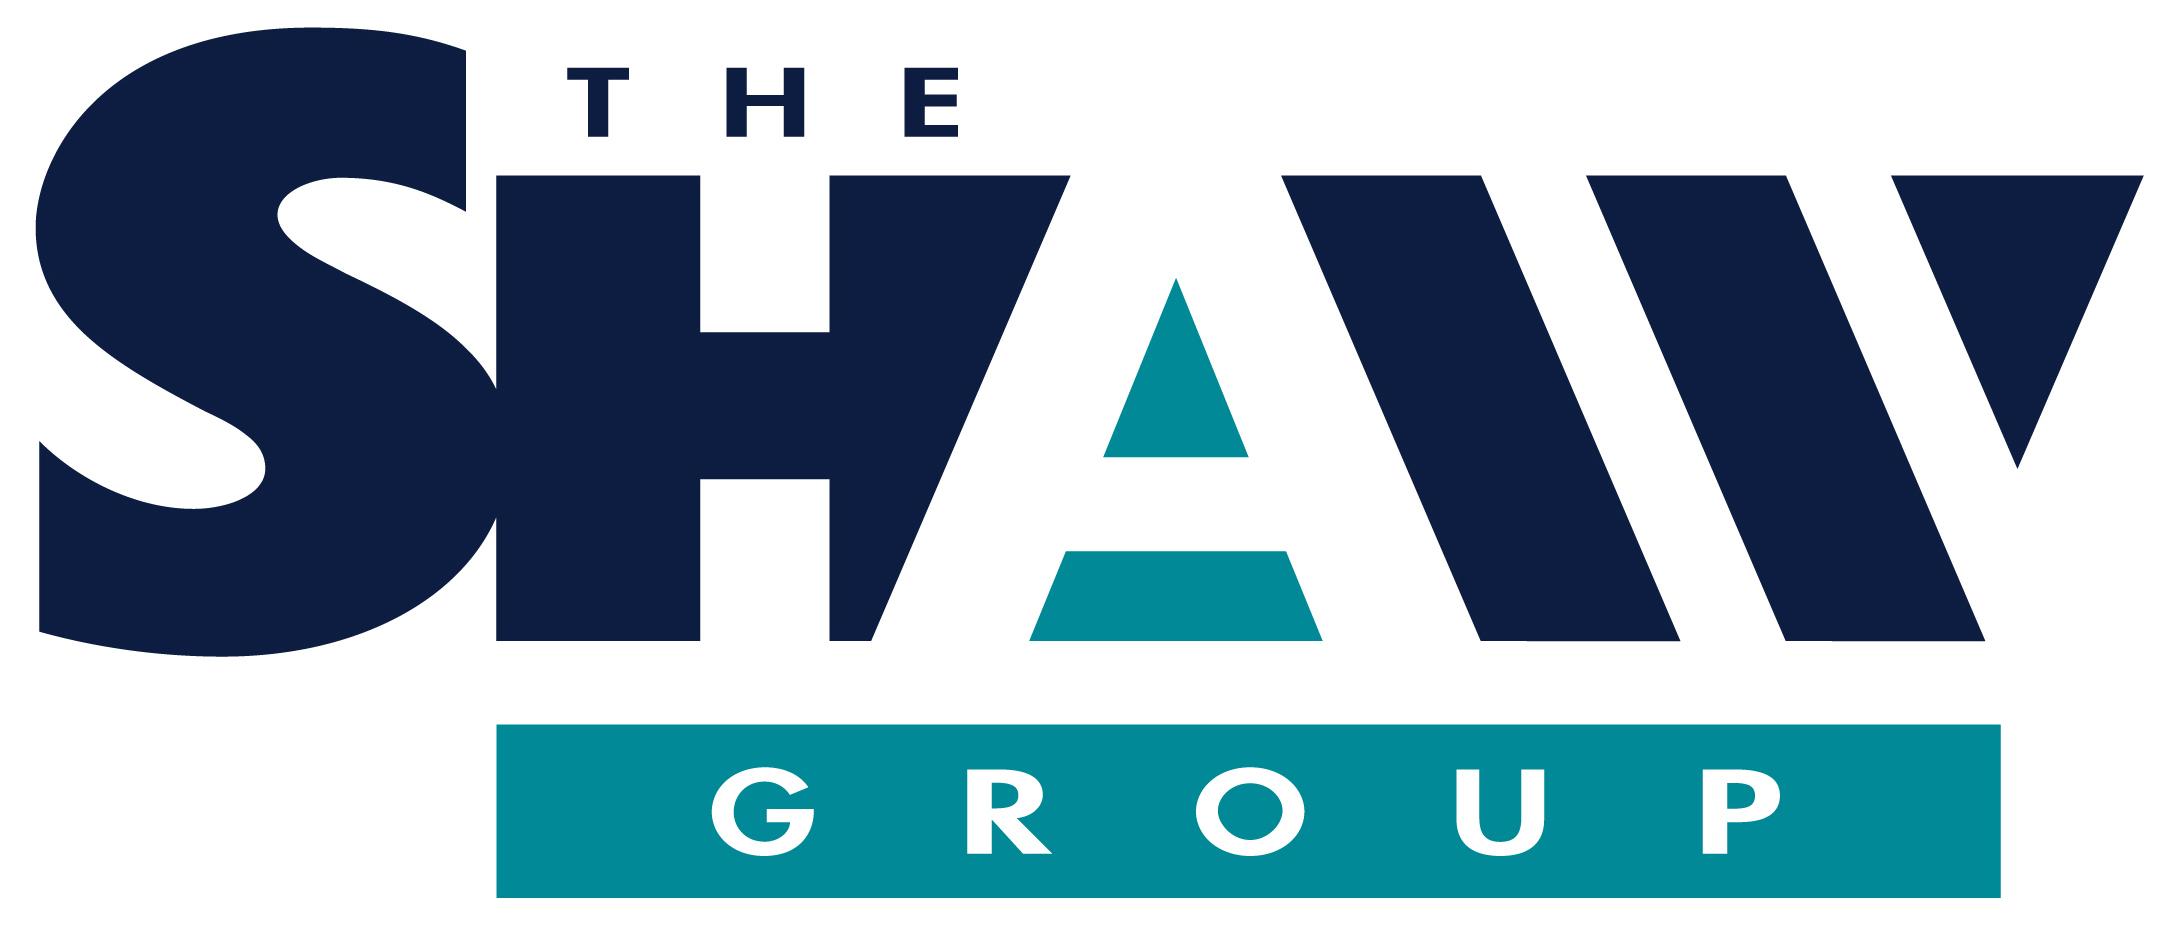 The Shaw Group Ltd.'s Logo